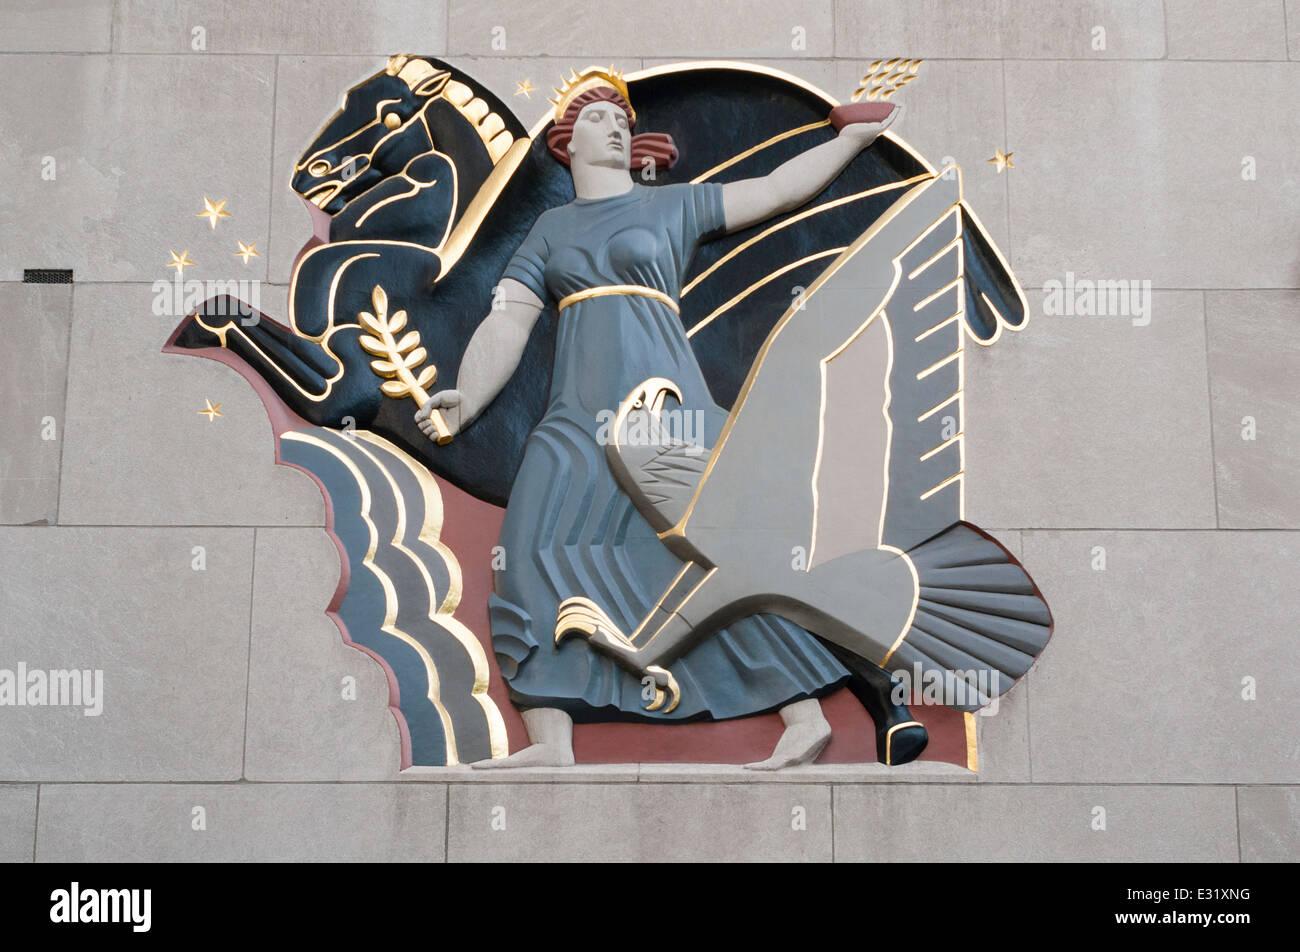 Progress Art Deco Relief at One Rockefeller Plaza - Stock Image